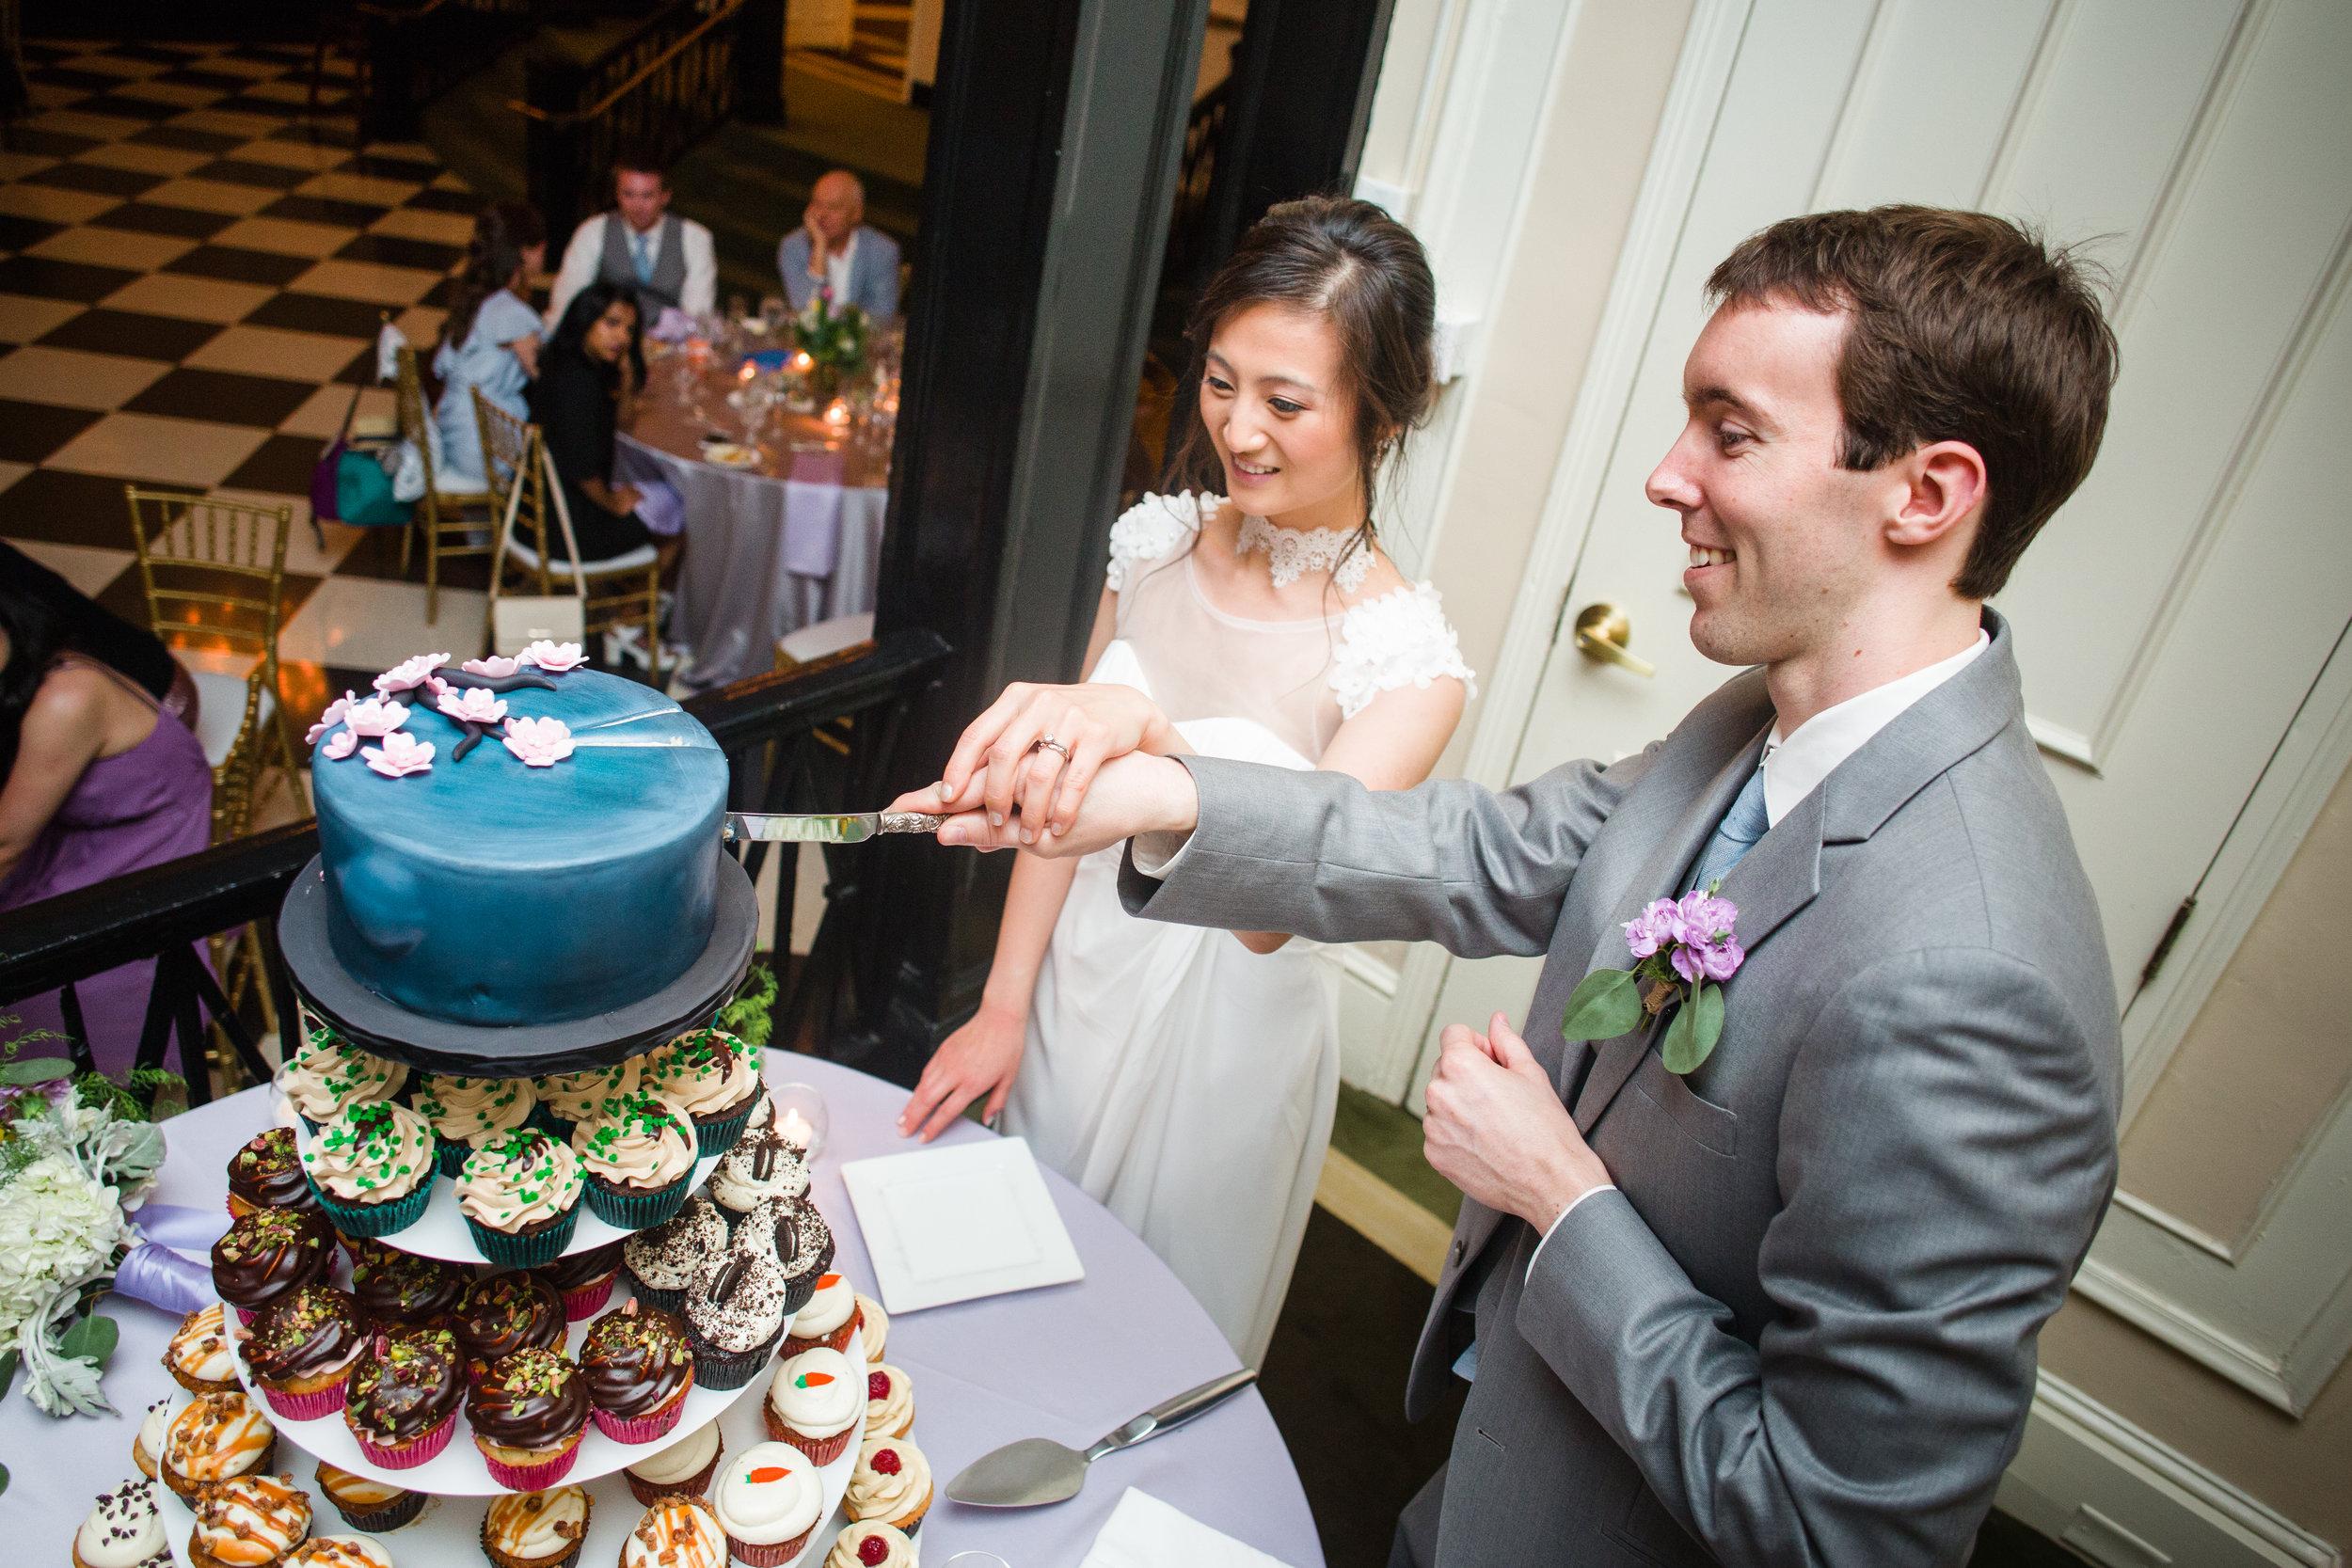 2017_04_30_jenny_jonathans_wedding_reception-151.jpg